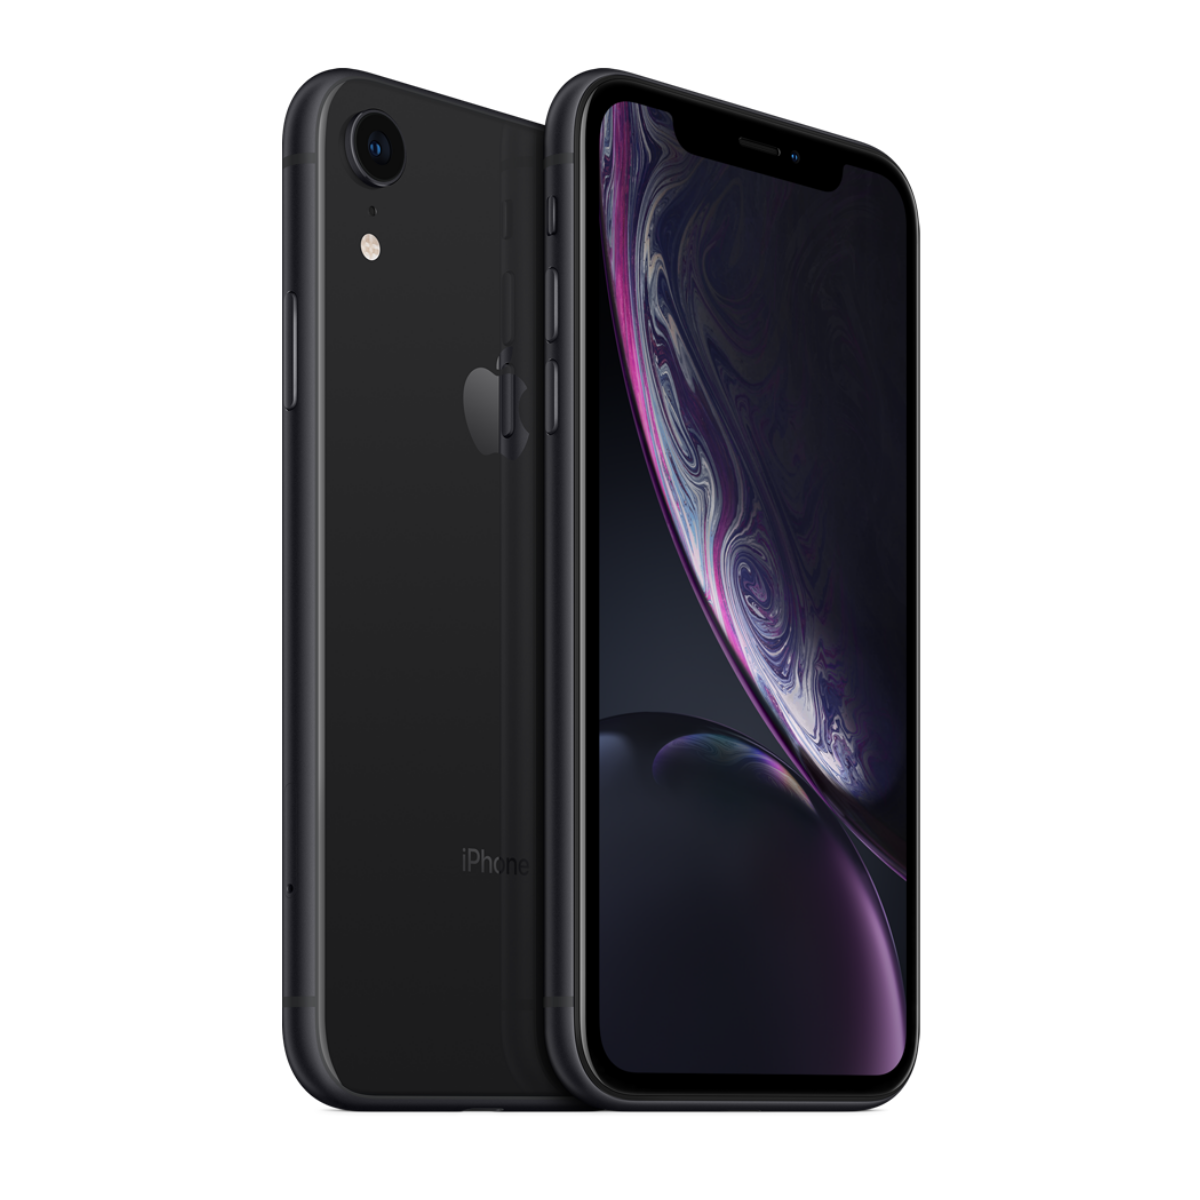 Sim Free Apple iPhone XR 64GB Unlocked Mobile Phone - Black